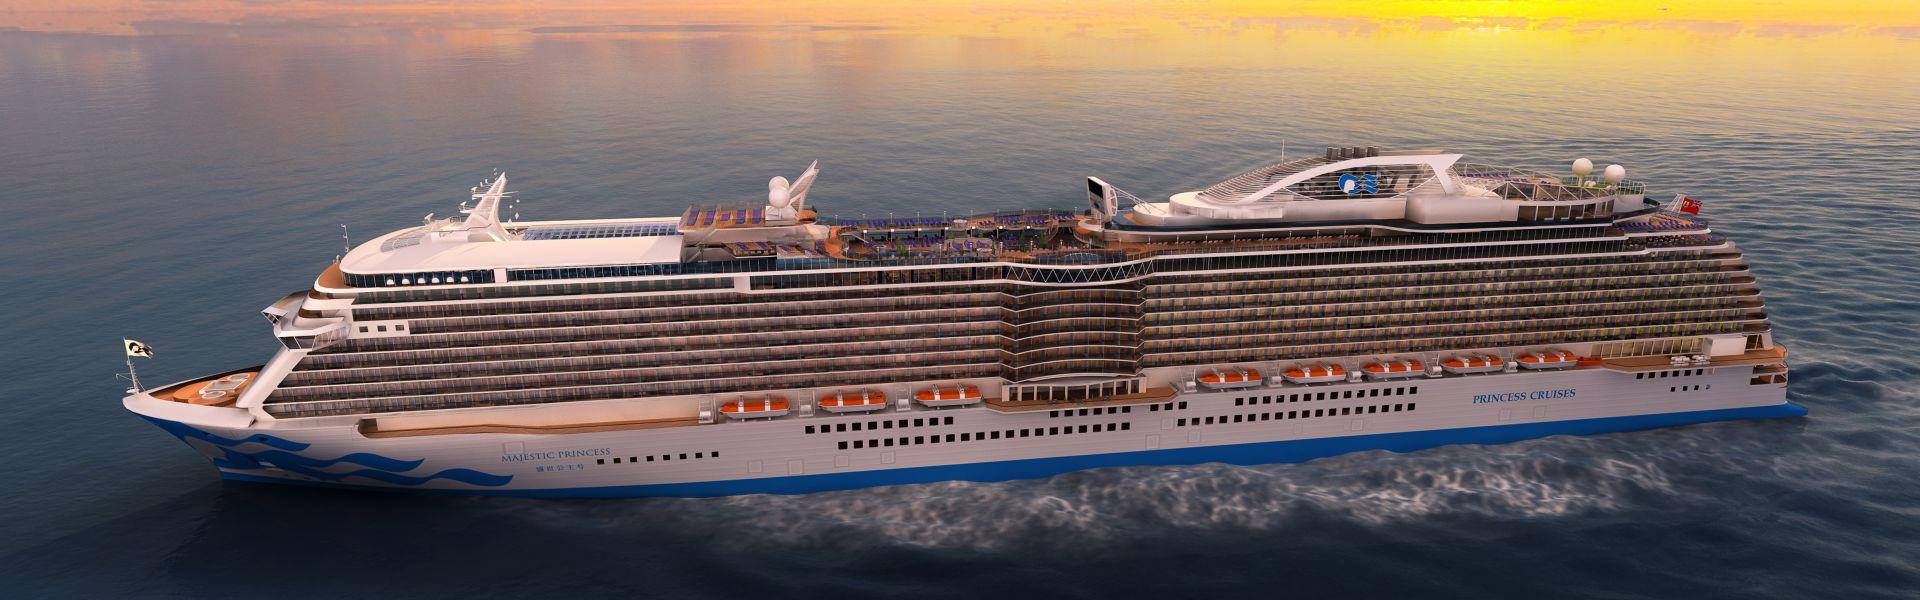 Croaziera 2017 - Marea Mediterana (Atena) - Princess Cruises - Majestic Princess - 7 nopti